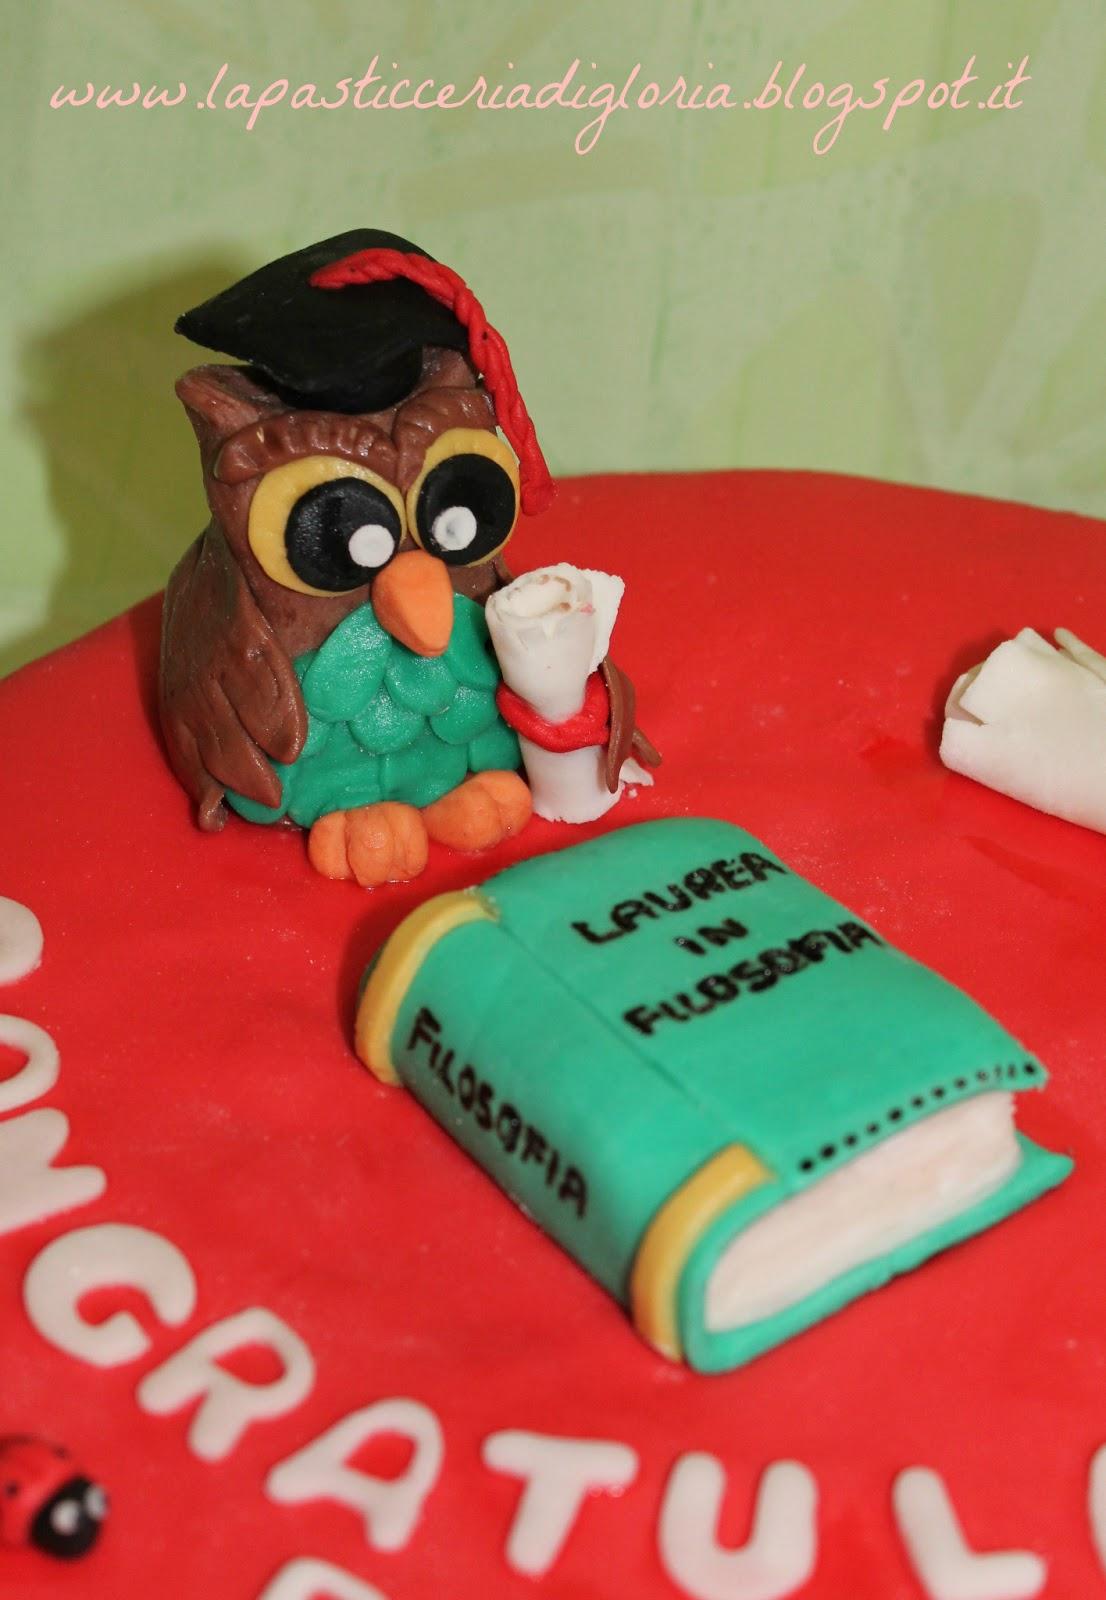 La pasticceria di gloria torta di laurea for Decorazioni per torte di laurea